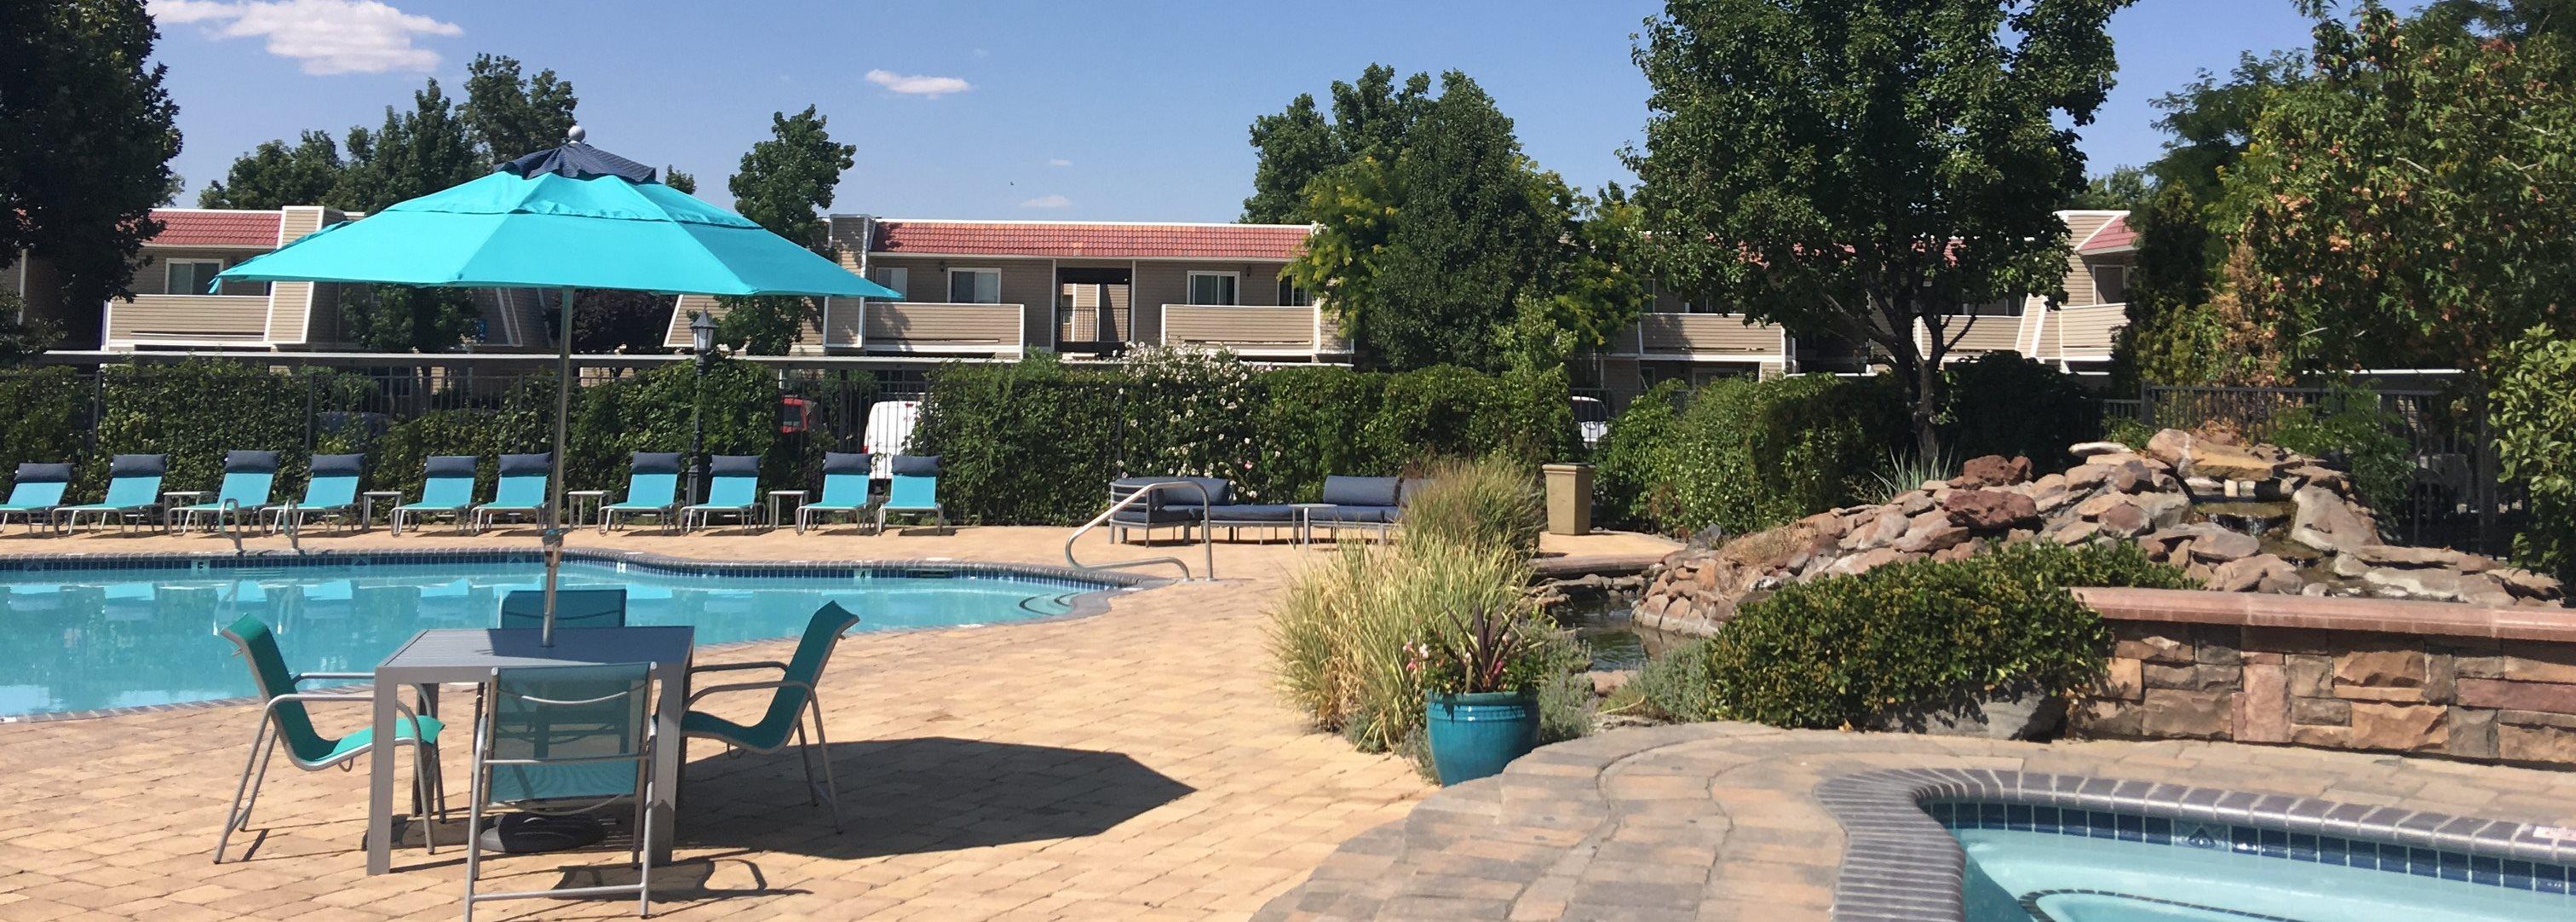 Pool and Spa at Reflections